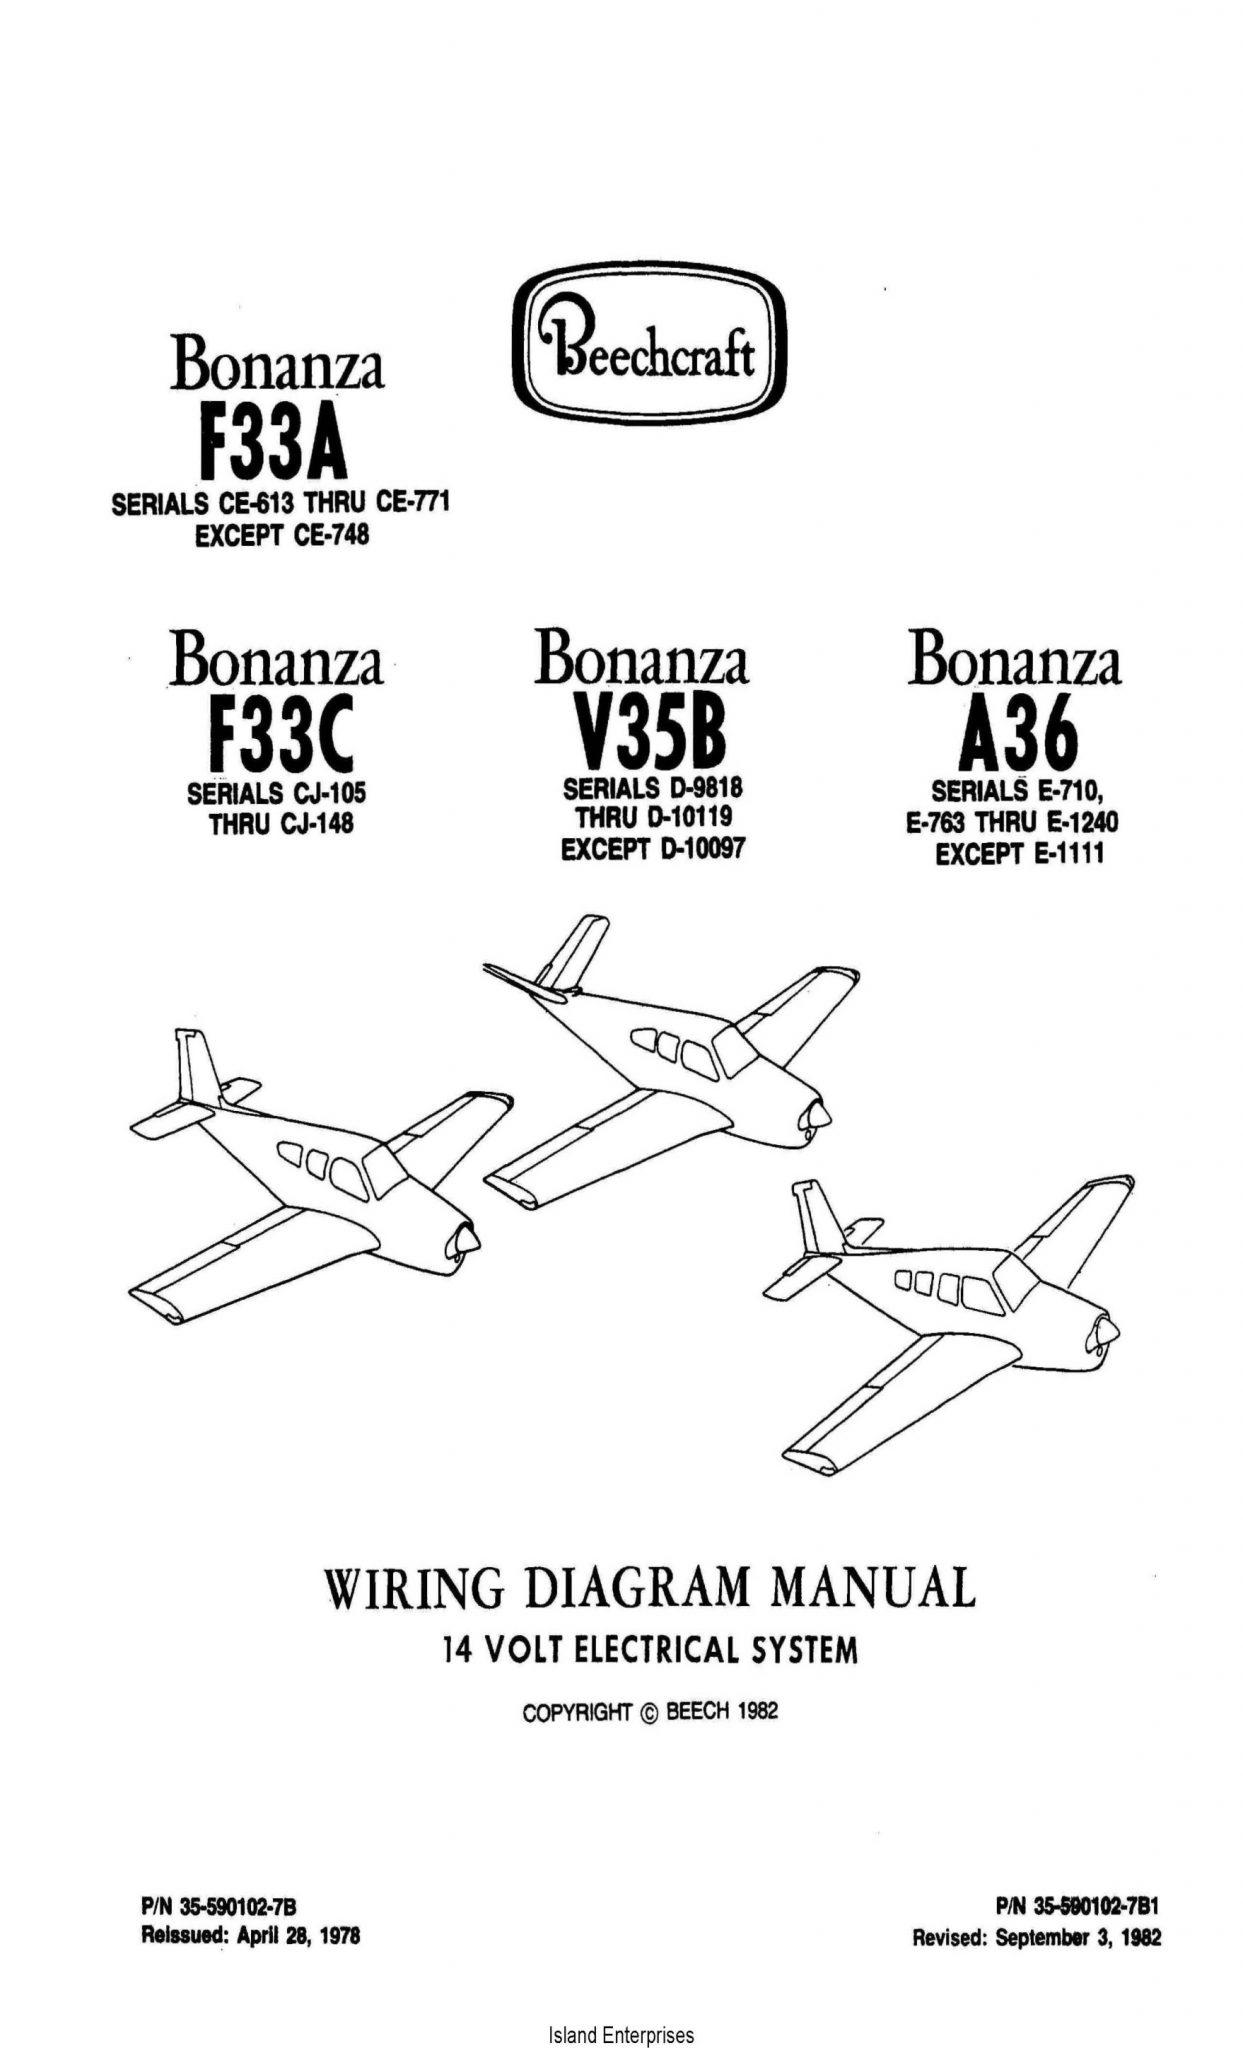 Beechcraft Bonanza F33a F33c V35b A36 14v Wiring Diagram Manual Rev 1982